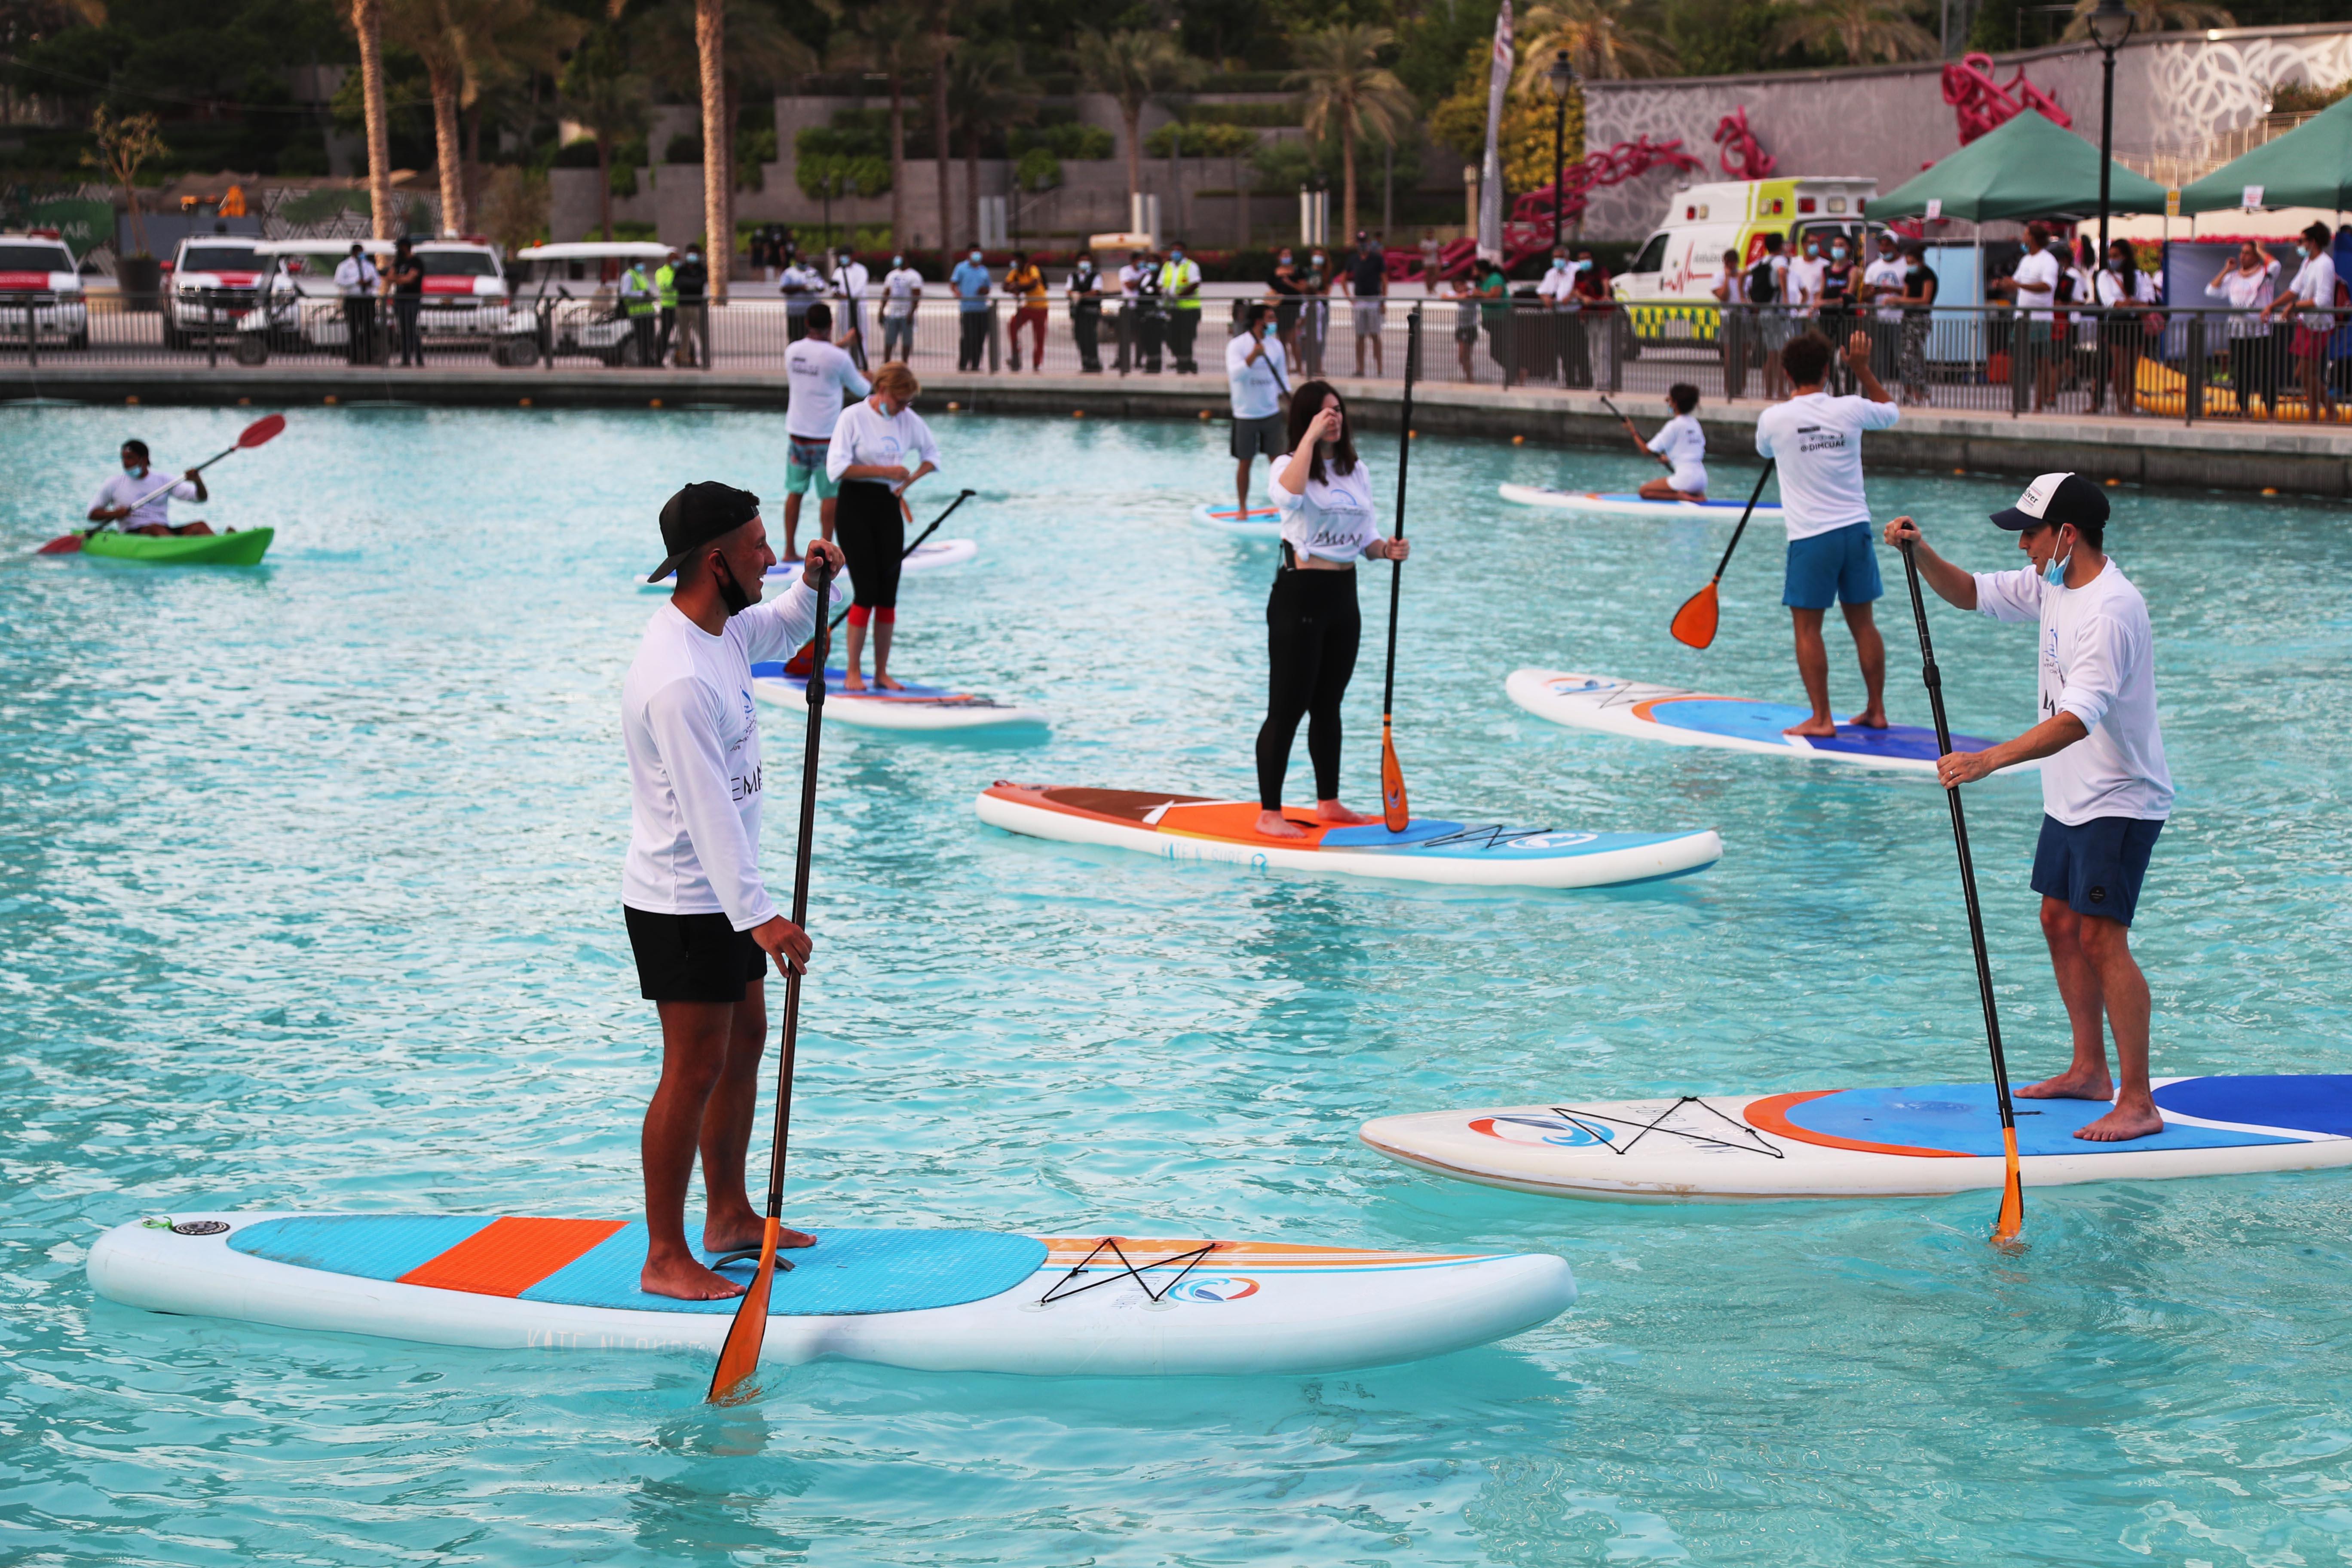 Standup Paddling Race at Hatta Dam Lake Today